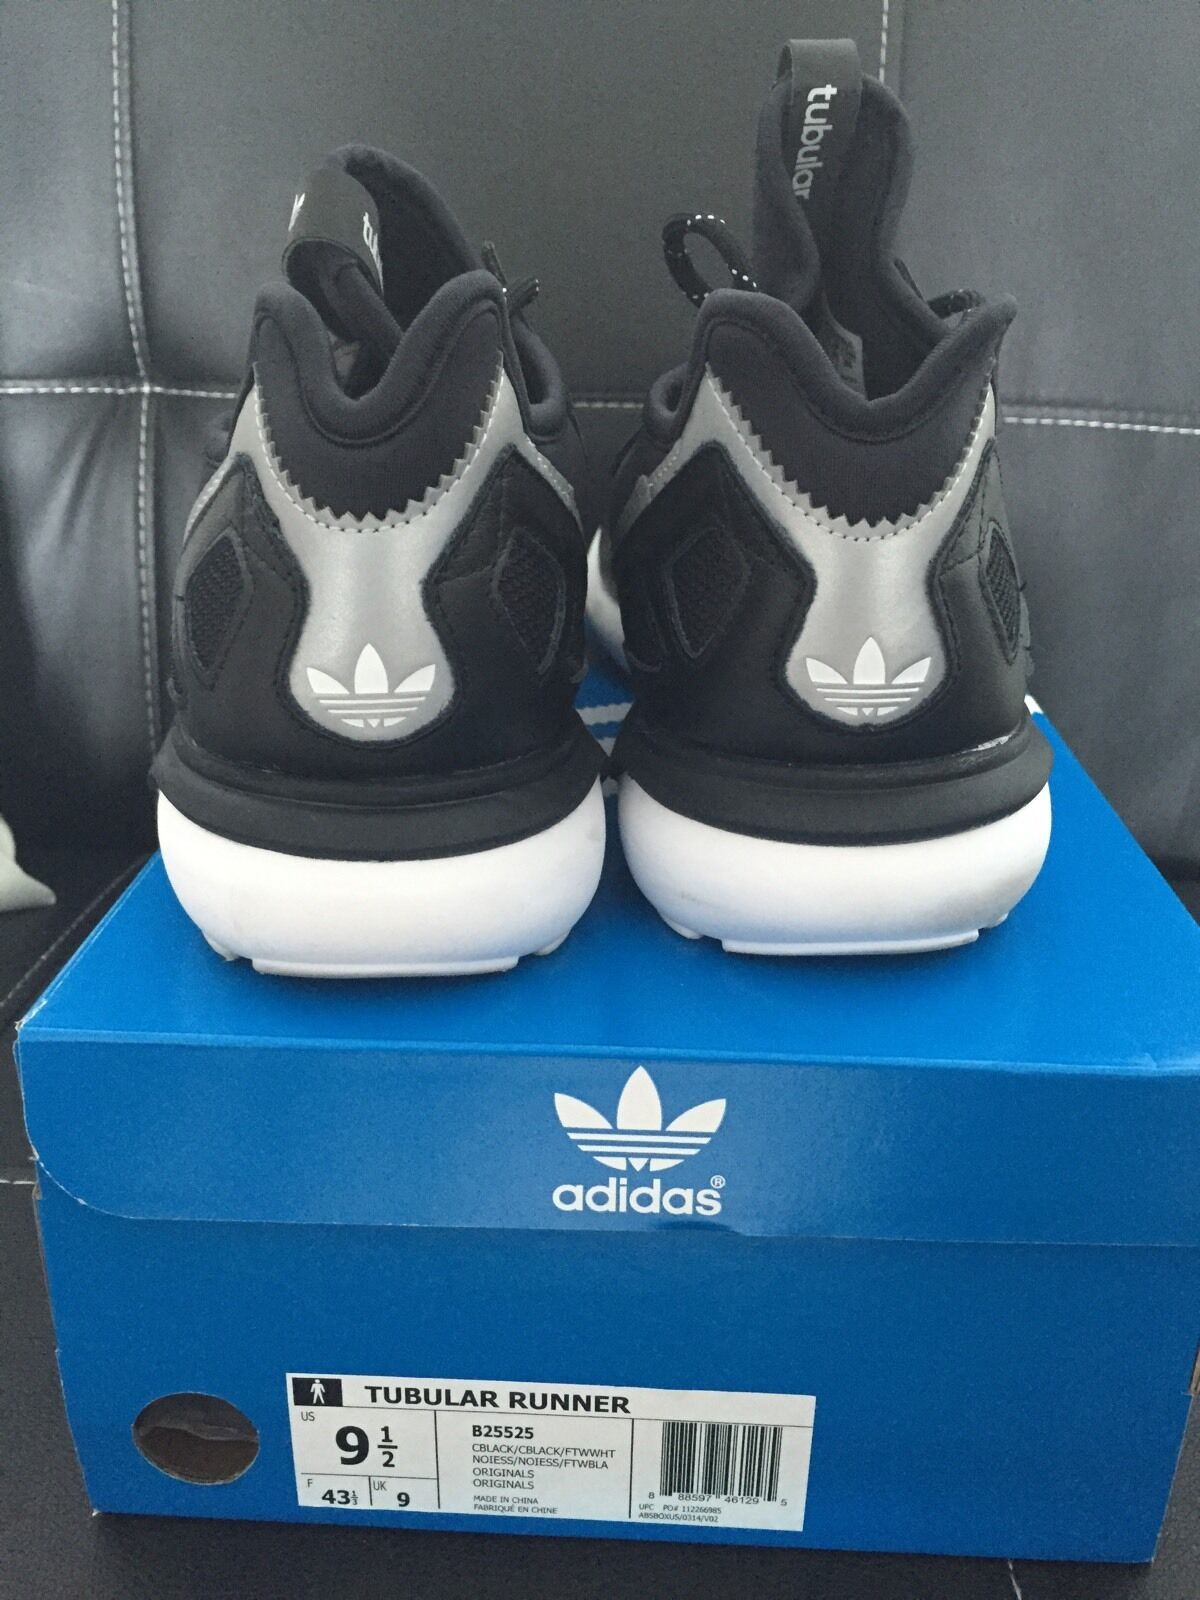 meet 75486 7dbf5 chic Adidas Originals Tubular Runner Shoes Black White ...